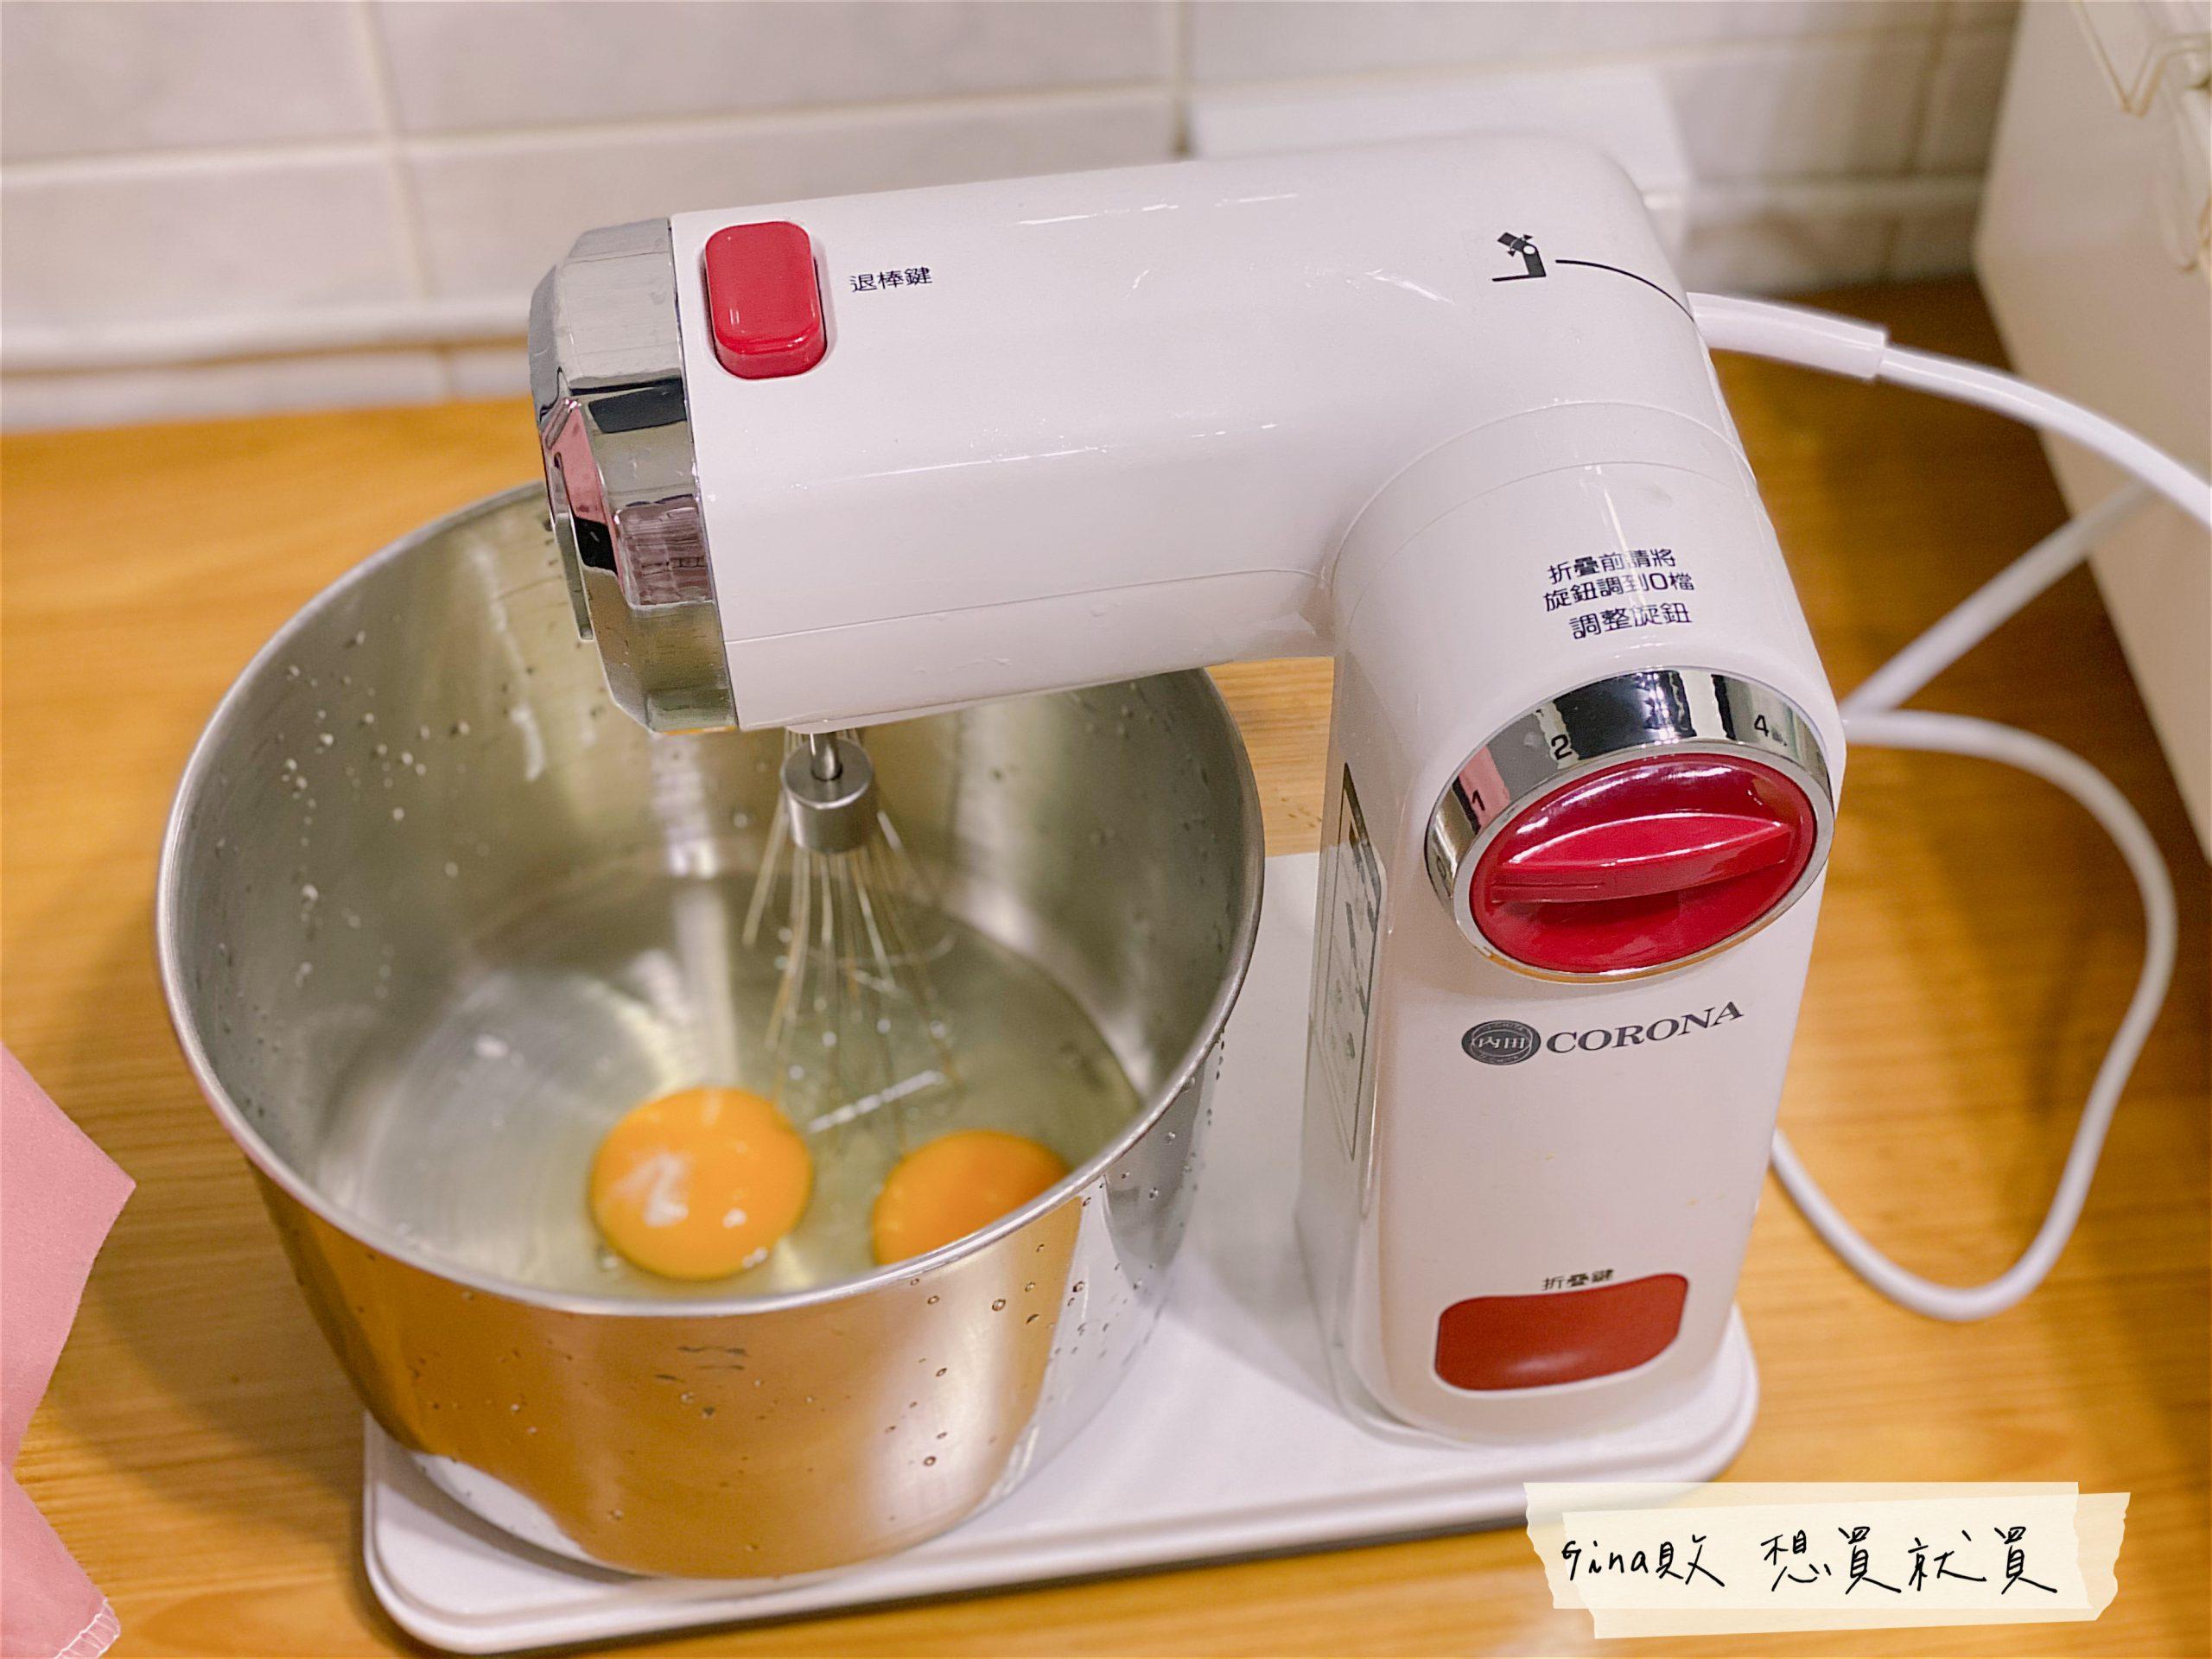 CORONA可樂娜摺疊式攪拌機|麵粉糰攪拌機團購|廚房烘焙必需品,烘焙器具材料! @GINA環球旅行生活